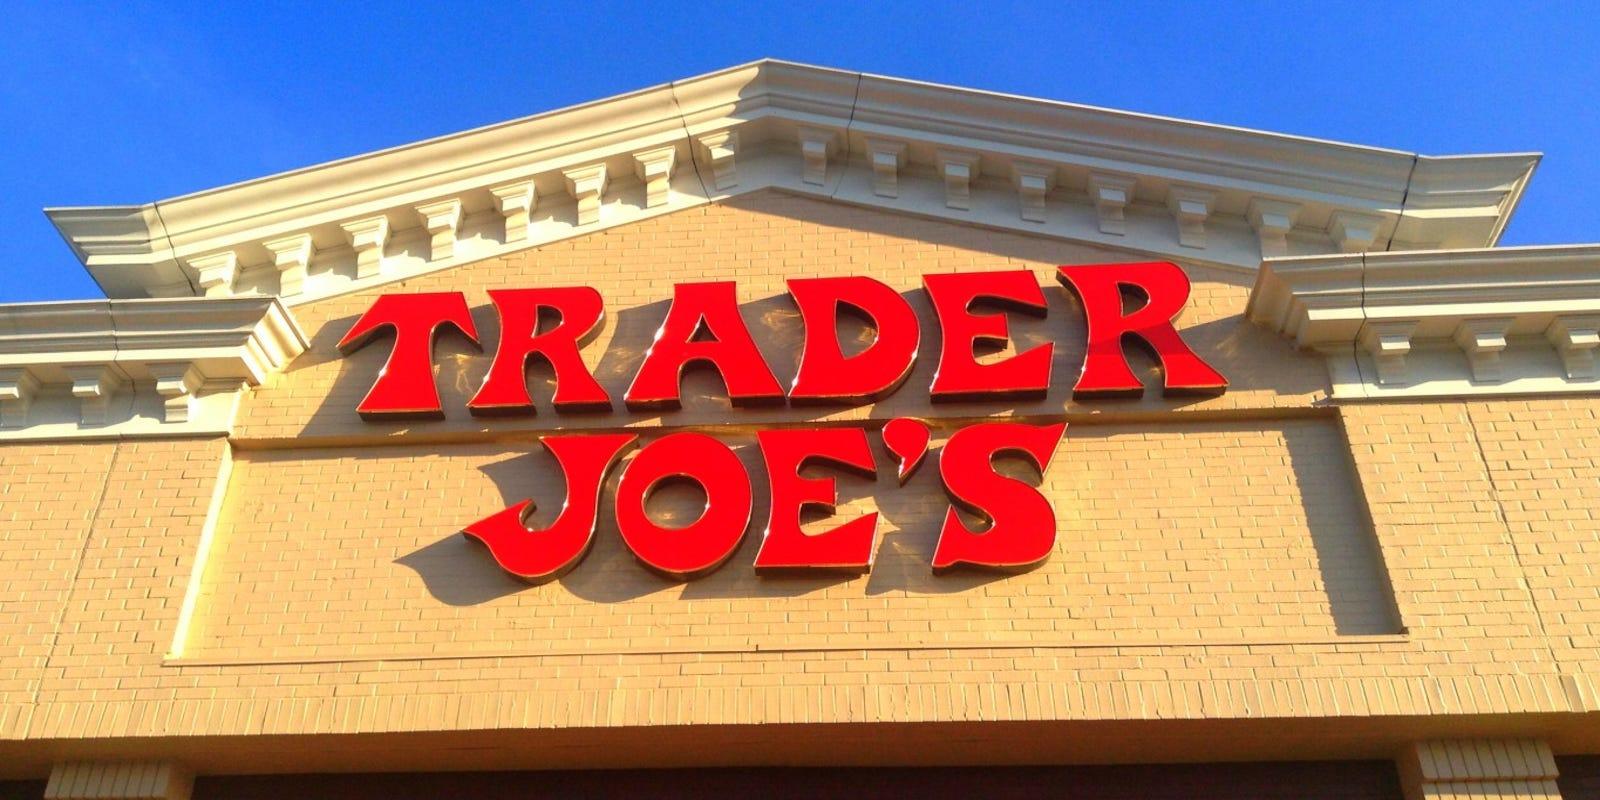 Trader Joe's fish recall: Gluten Free Battered Halibut recalled in 19 states over undeclared wheat milk allergens – USA TODAY